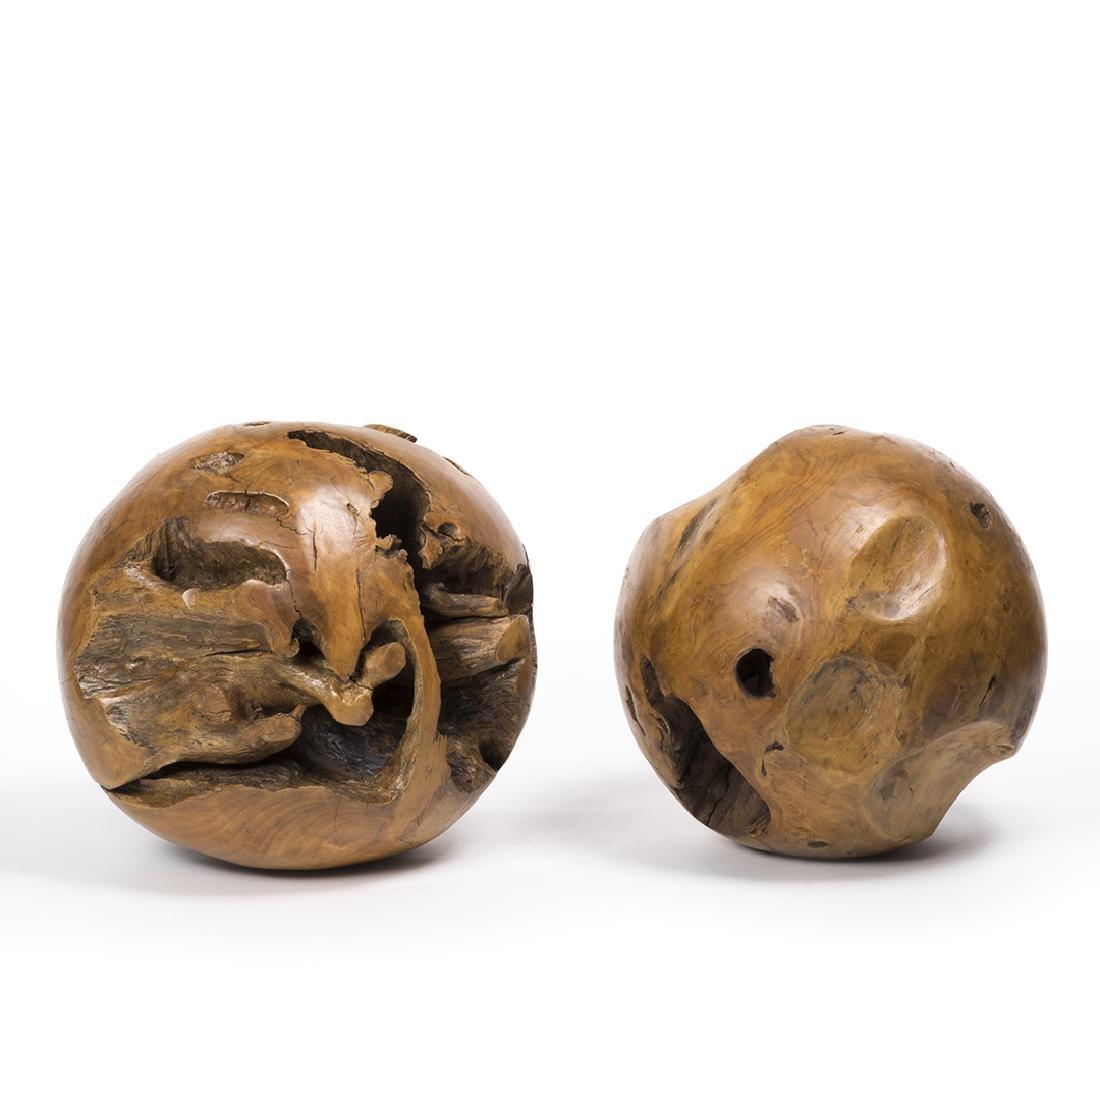 Big Burlwood Balls (2) - 2